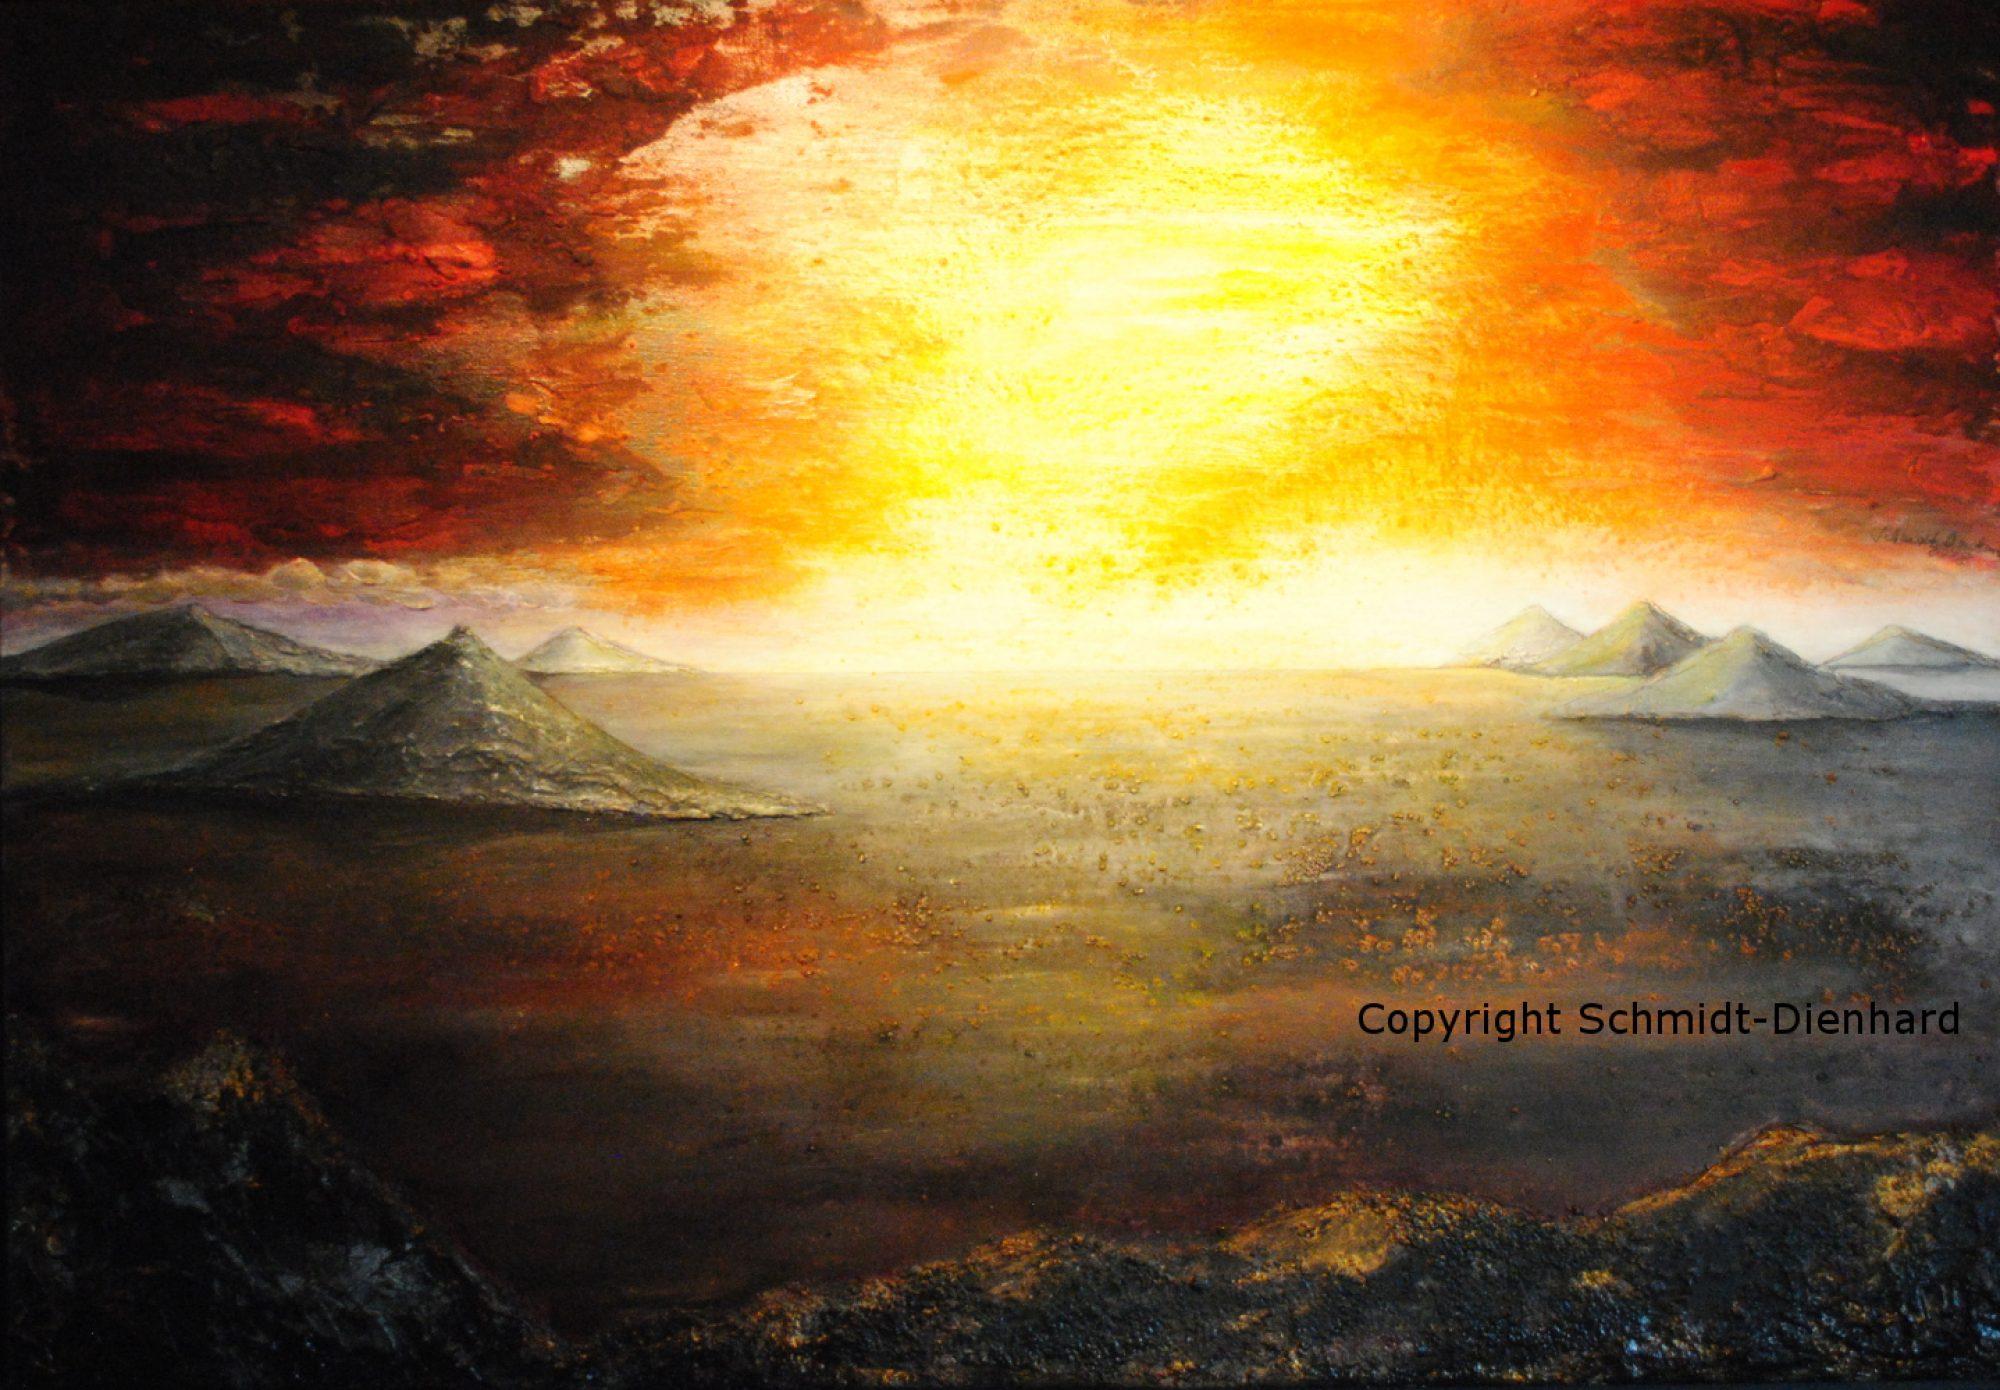 Feuermorgen - Lanzarote - Bild l026 - 130 x 90 cm 2018 - Acrylmalerei